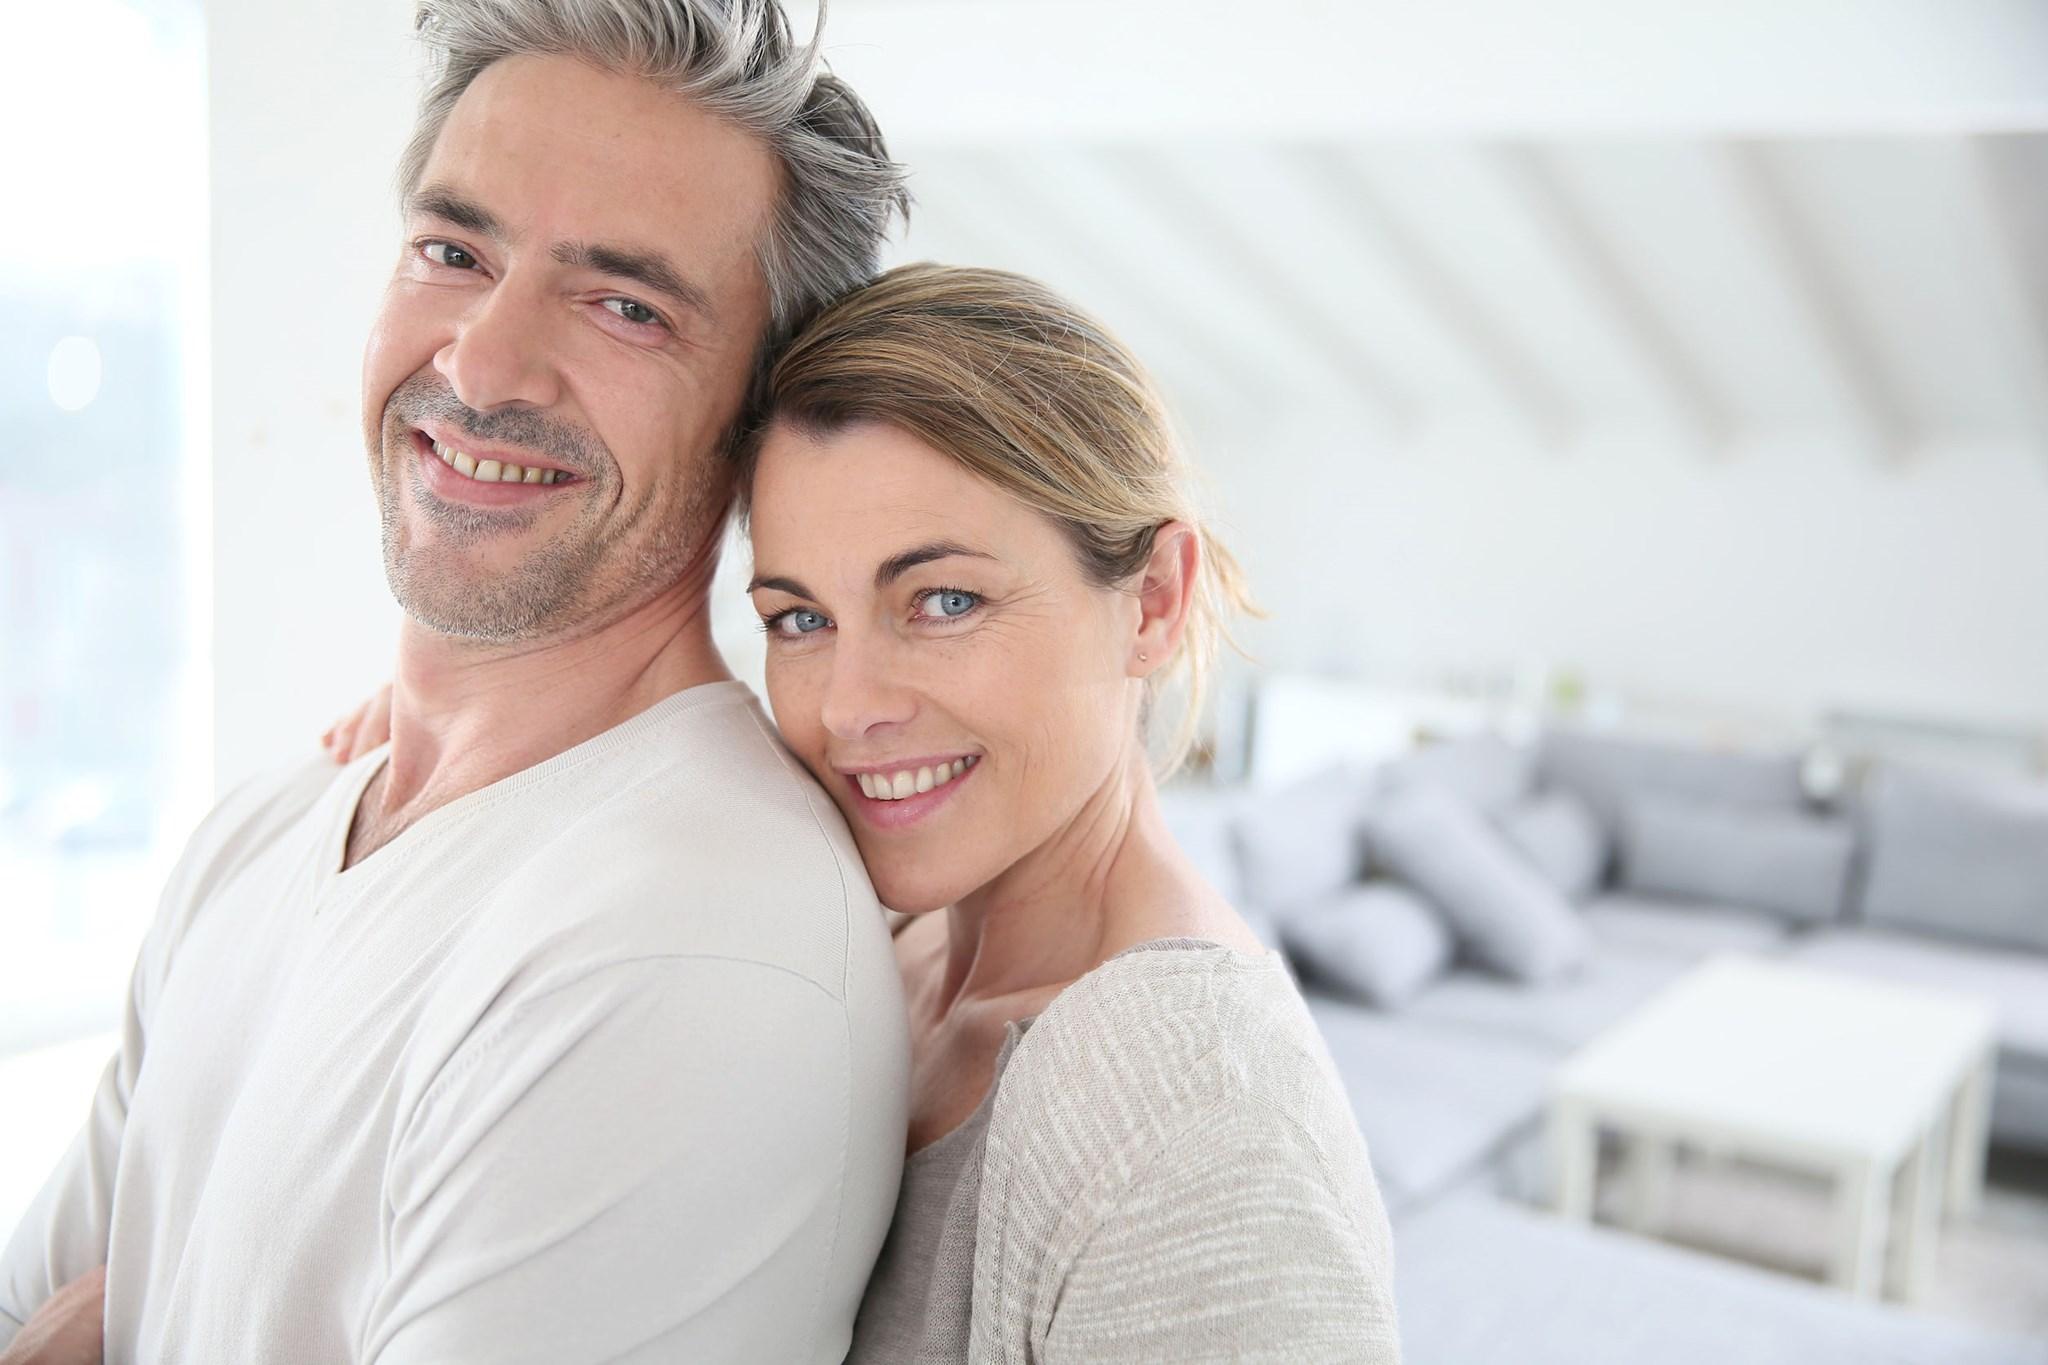 dating με την εγκυμοσύνη σου μετά την αποβολή γνωριμίες σε Μιλάνο